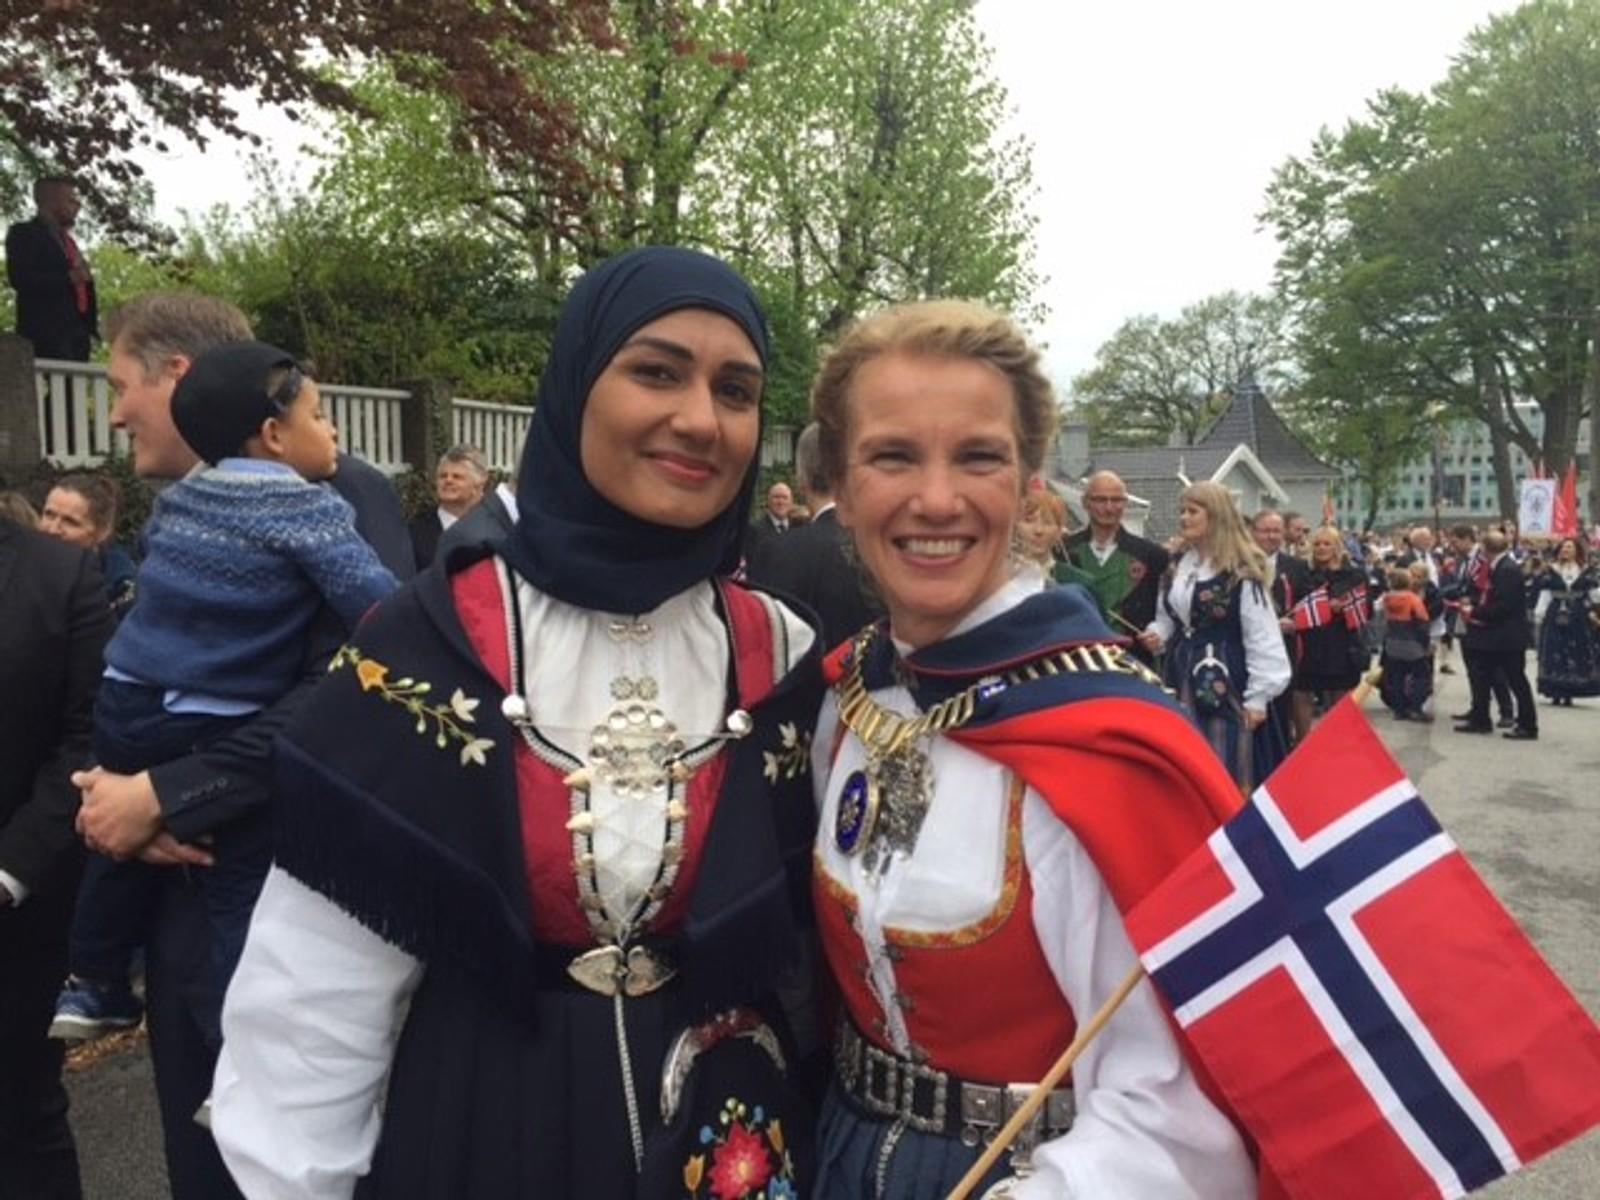 Arbeiderpartiets Sahfana M. Ali og ordfører Christine Sagen Helgø (H) var på plass for å se folketoget i Stavanger.